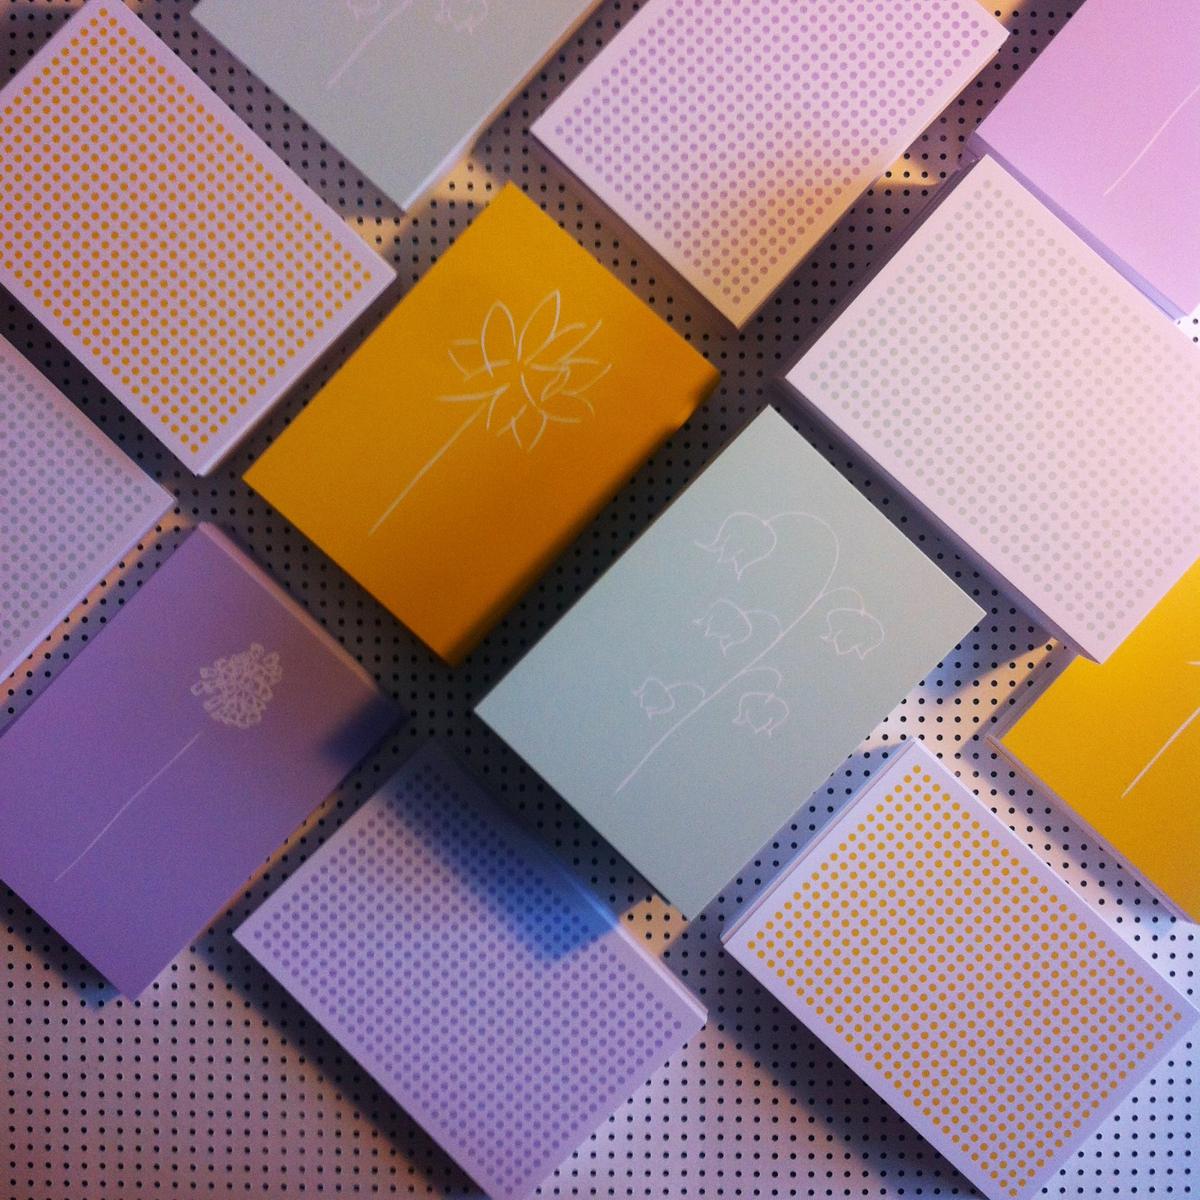 Collections-Spring-Postcard-Flower-Polkadot-Hamide-Design-Studio